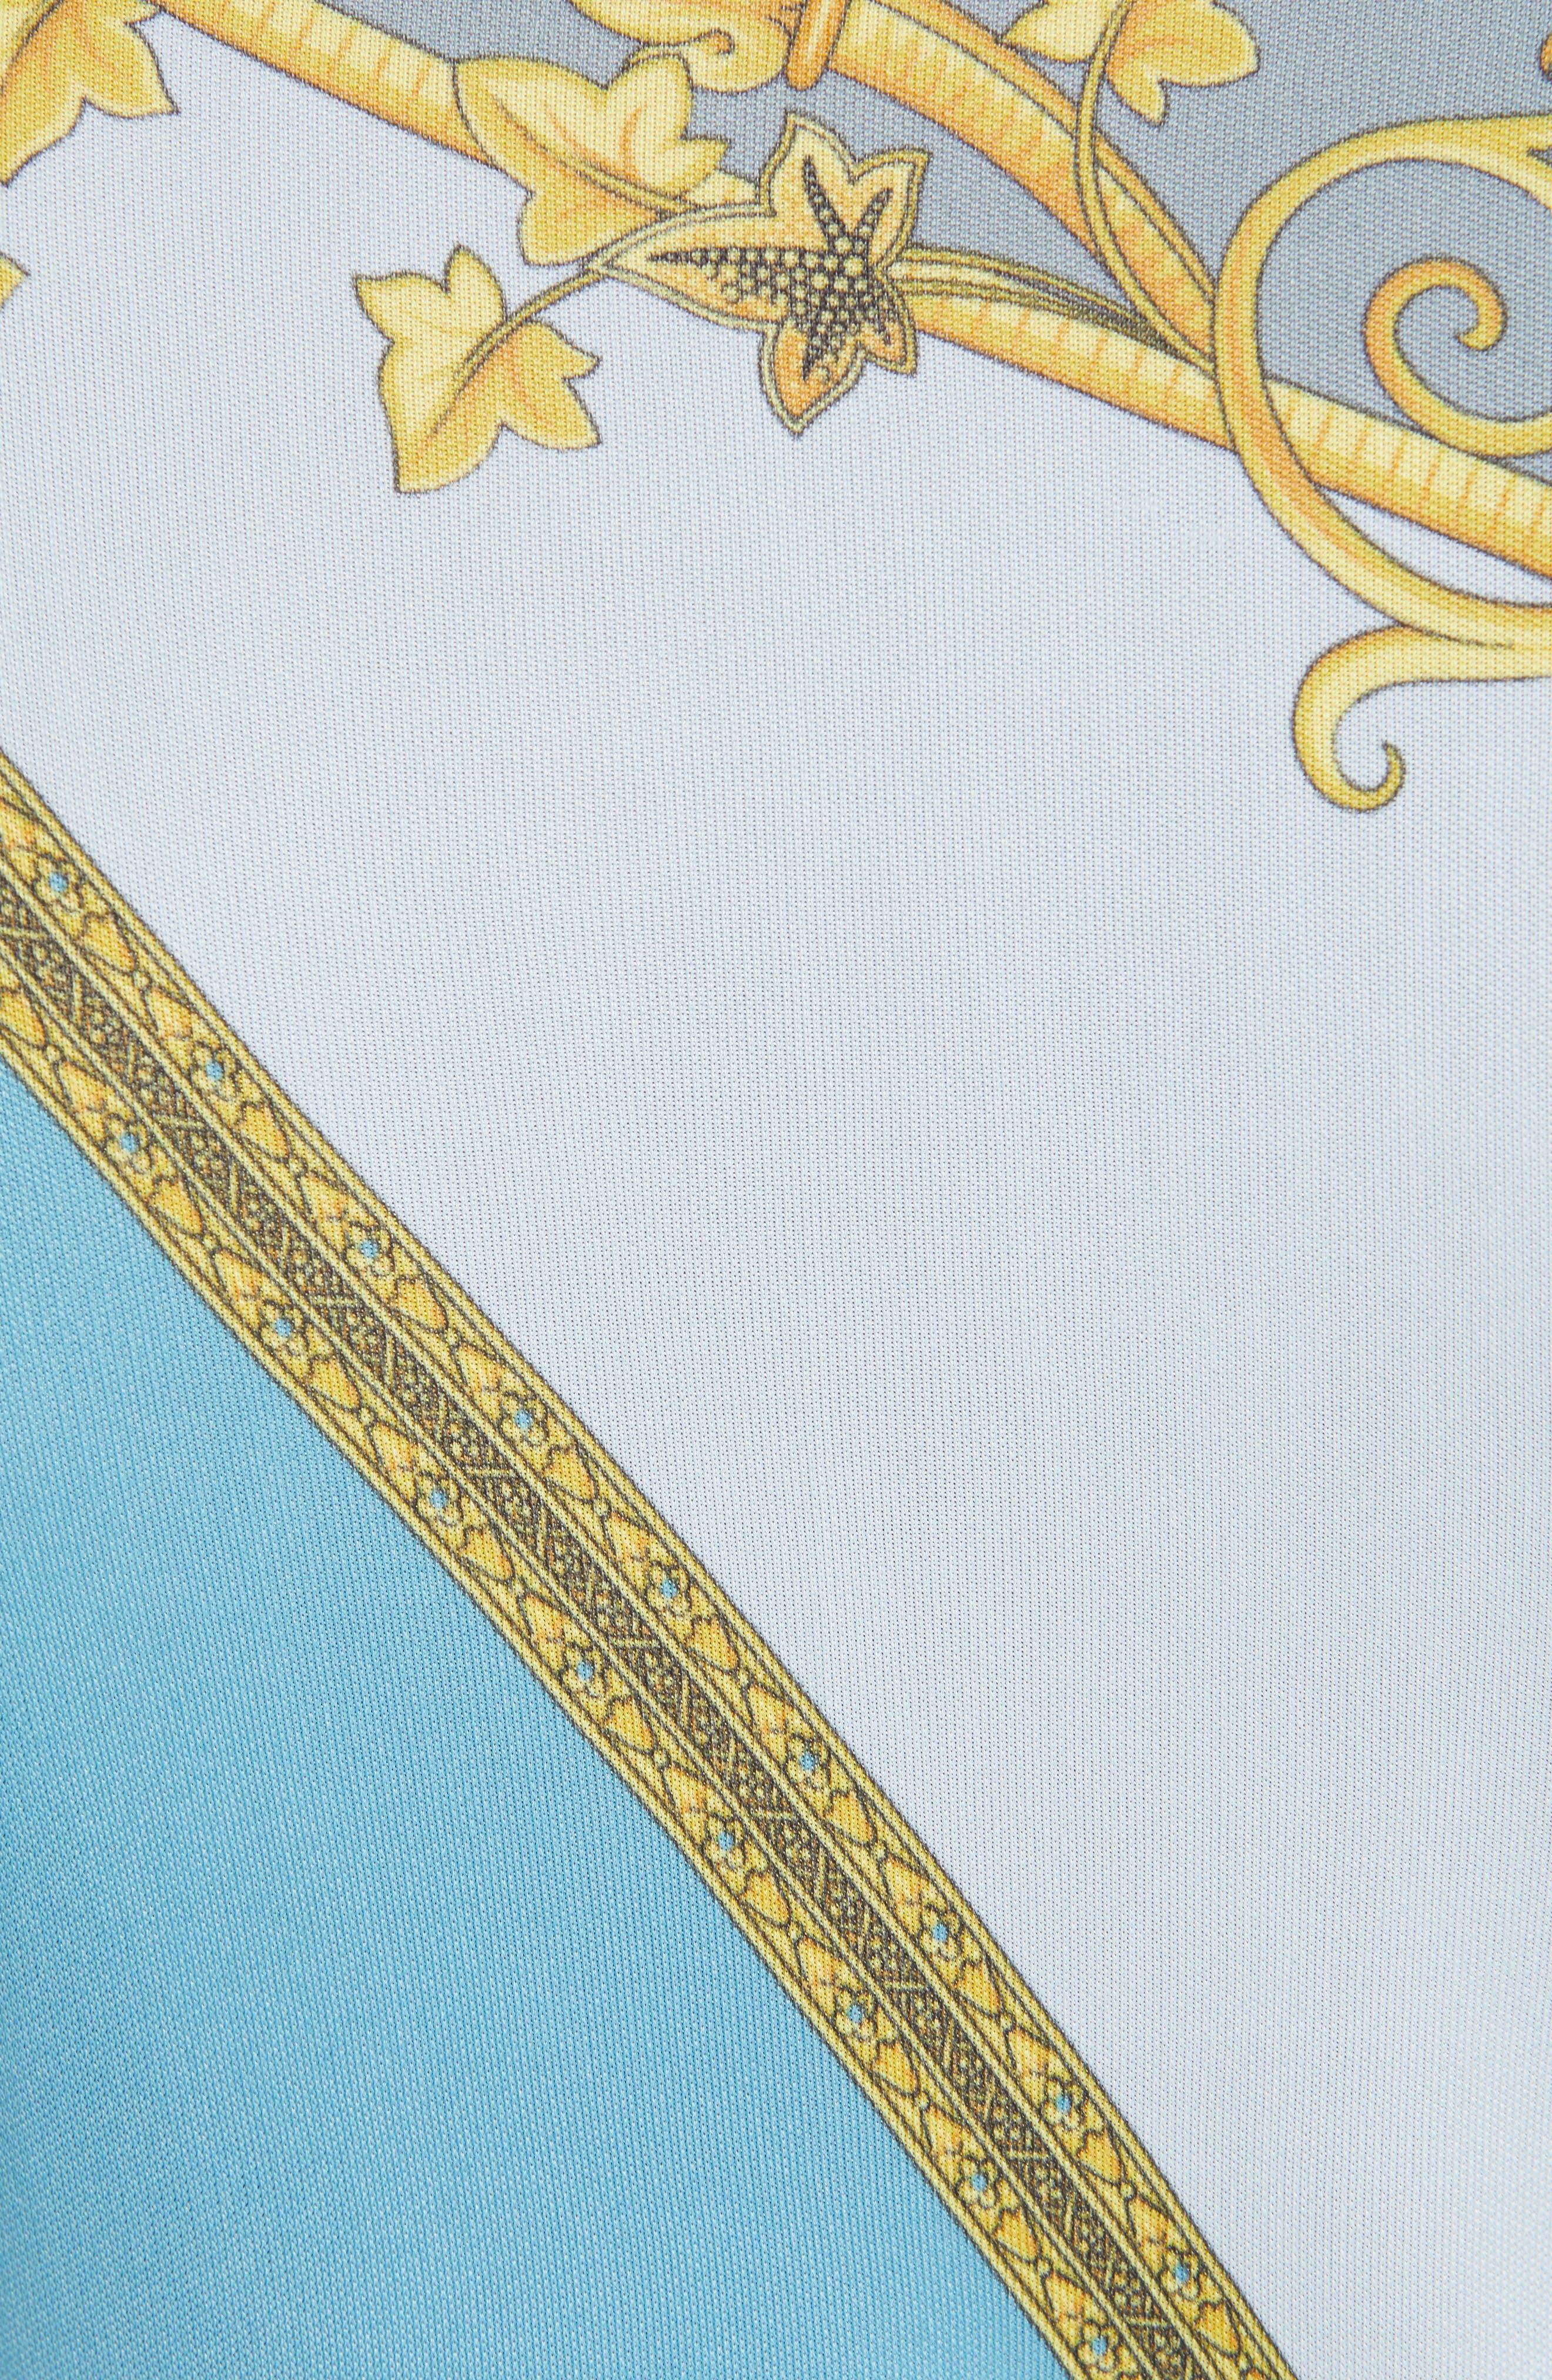 VERSACE COLLECTION, Barocco & Eyeshadow Print Tee, Alternate thumbnail 5, color, 456